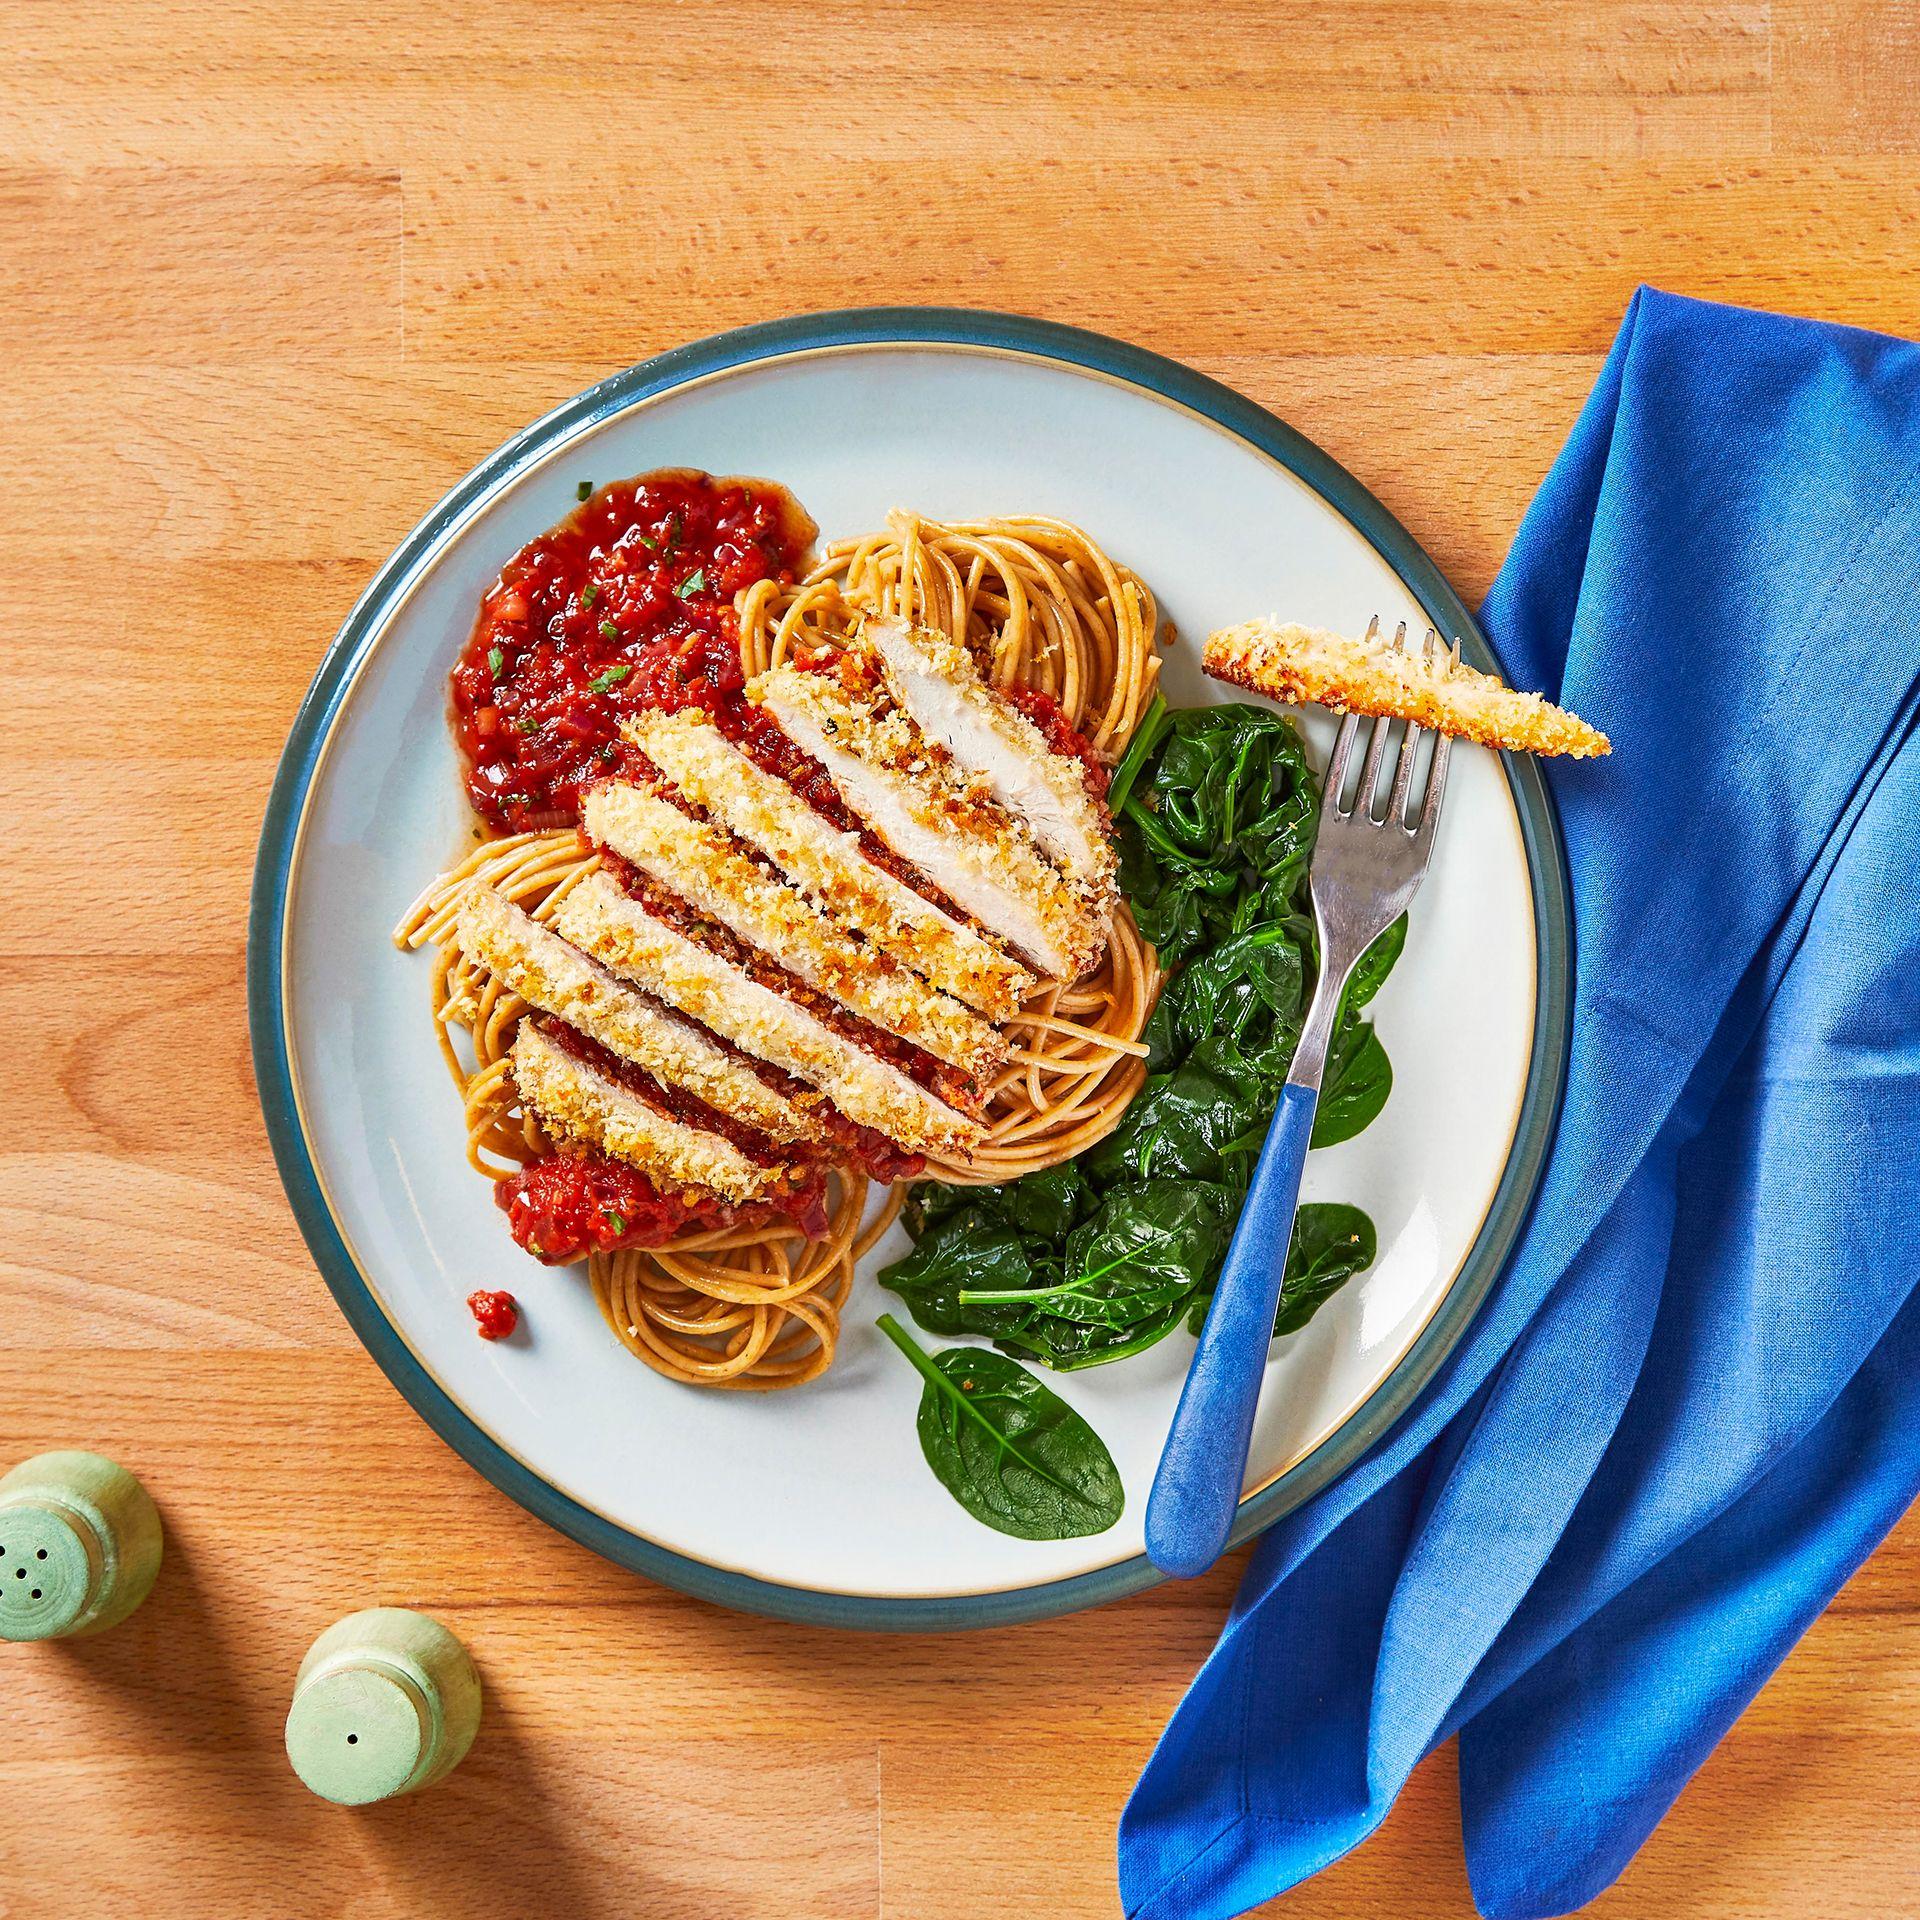 Recipes Quick And Easy Dinner Ideas Recipe Milanese Recipe Gousto Recipes Recipes